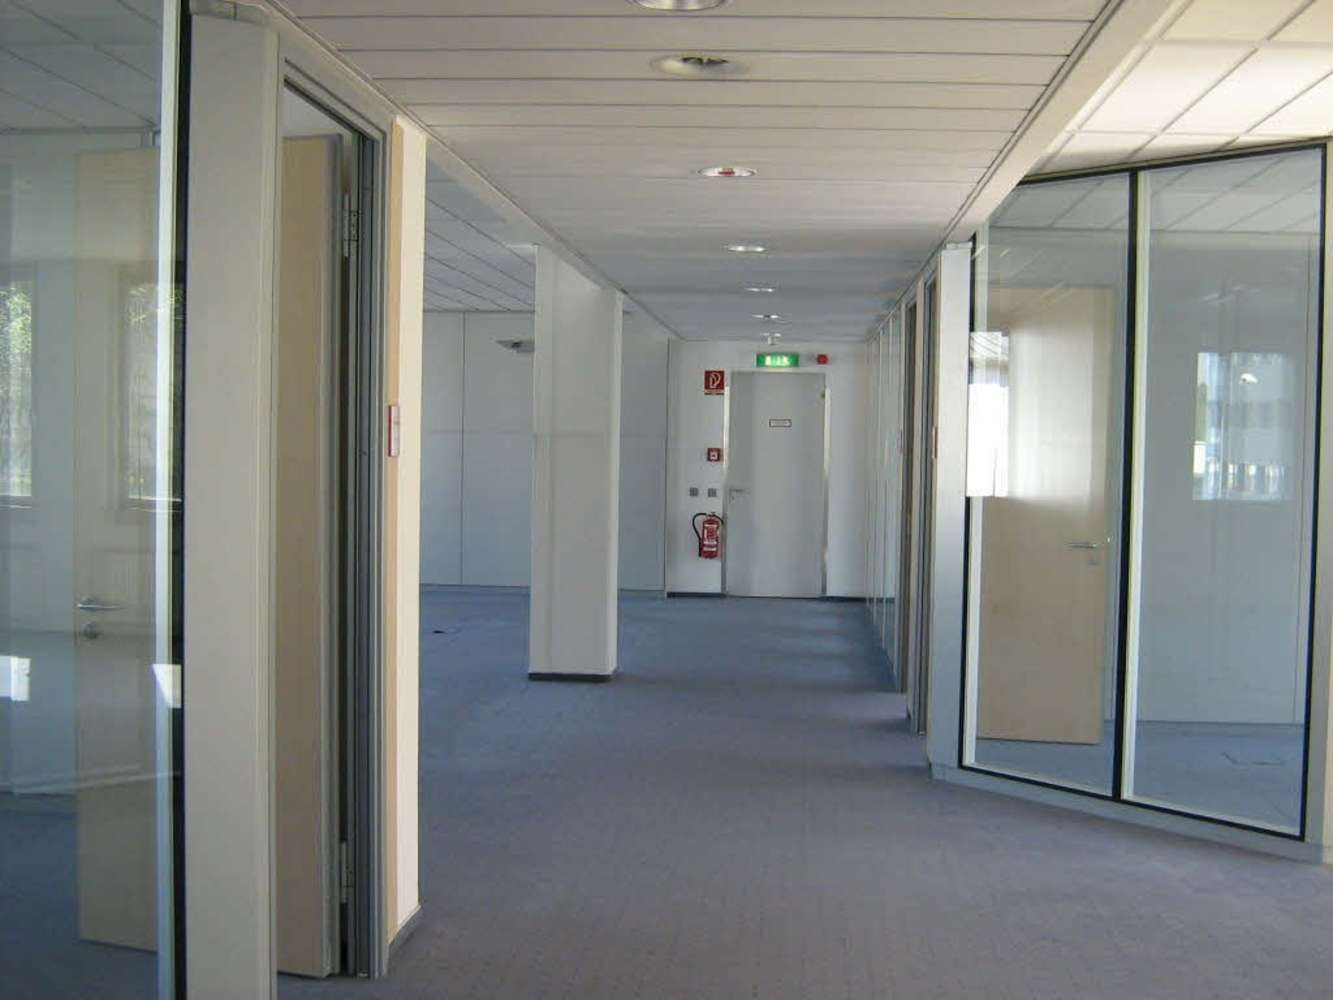 Büros Langen (hessen), 63225 - Büro - Langen (Hessen), Industriegebiet - F0003 - 9411125